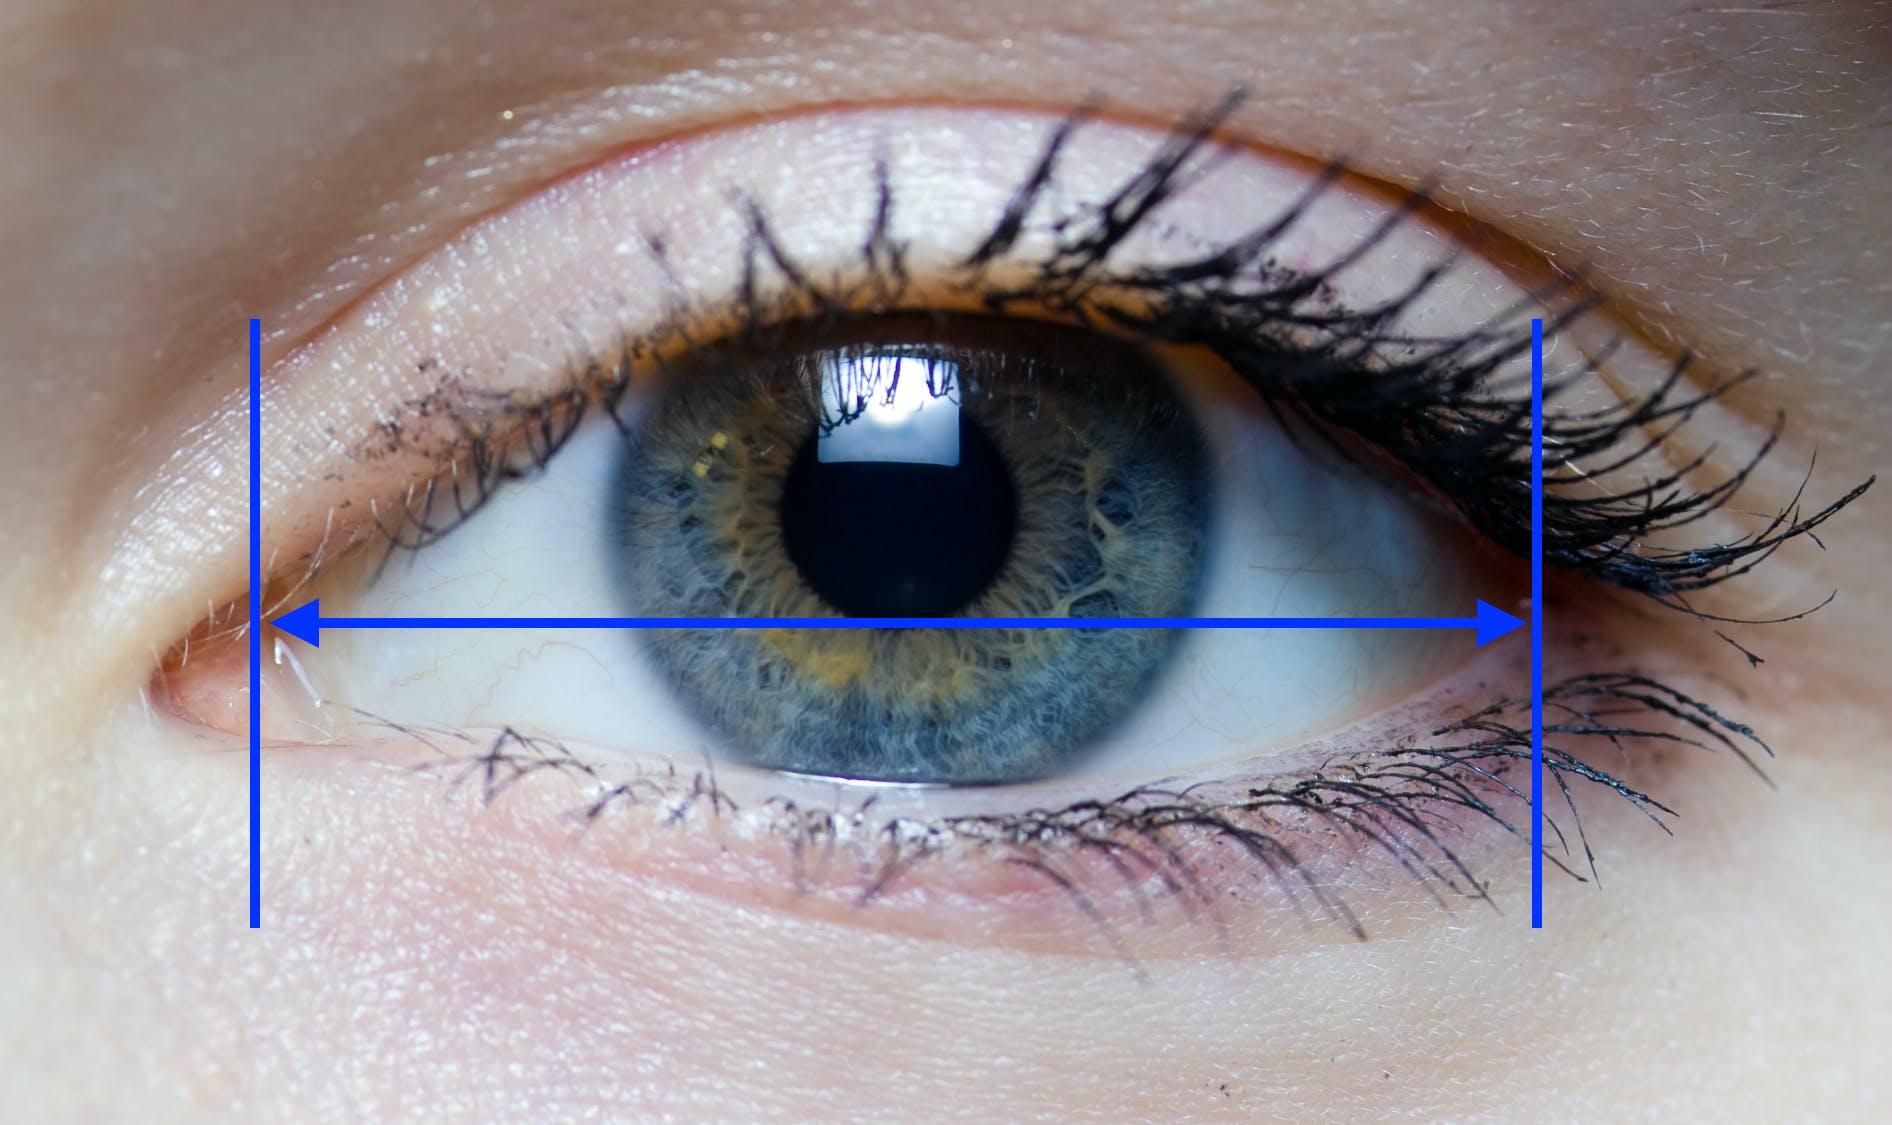 Iris_-_right_eye_of_a_girl.jpg